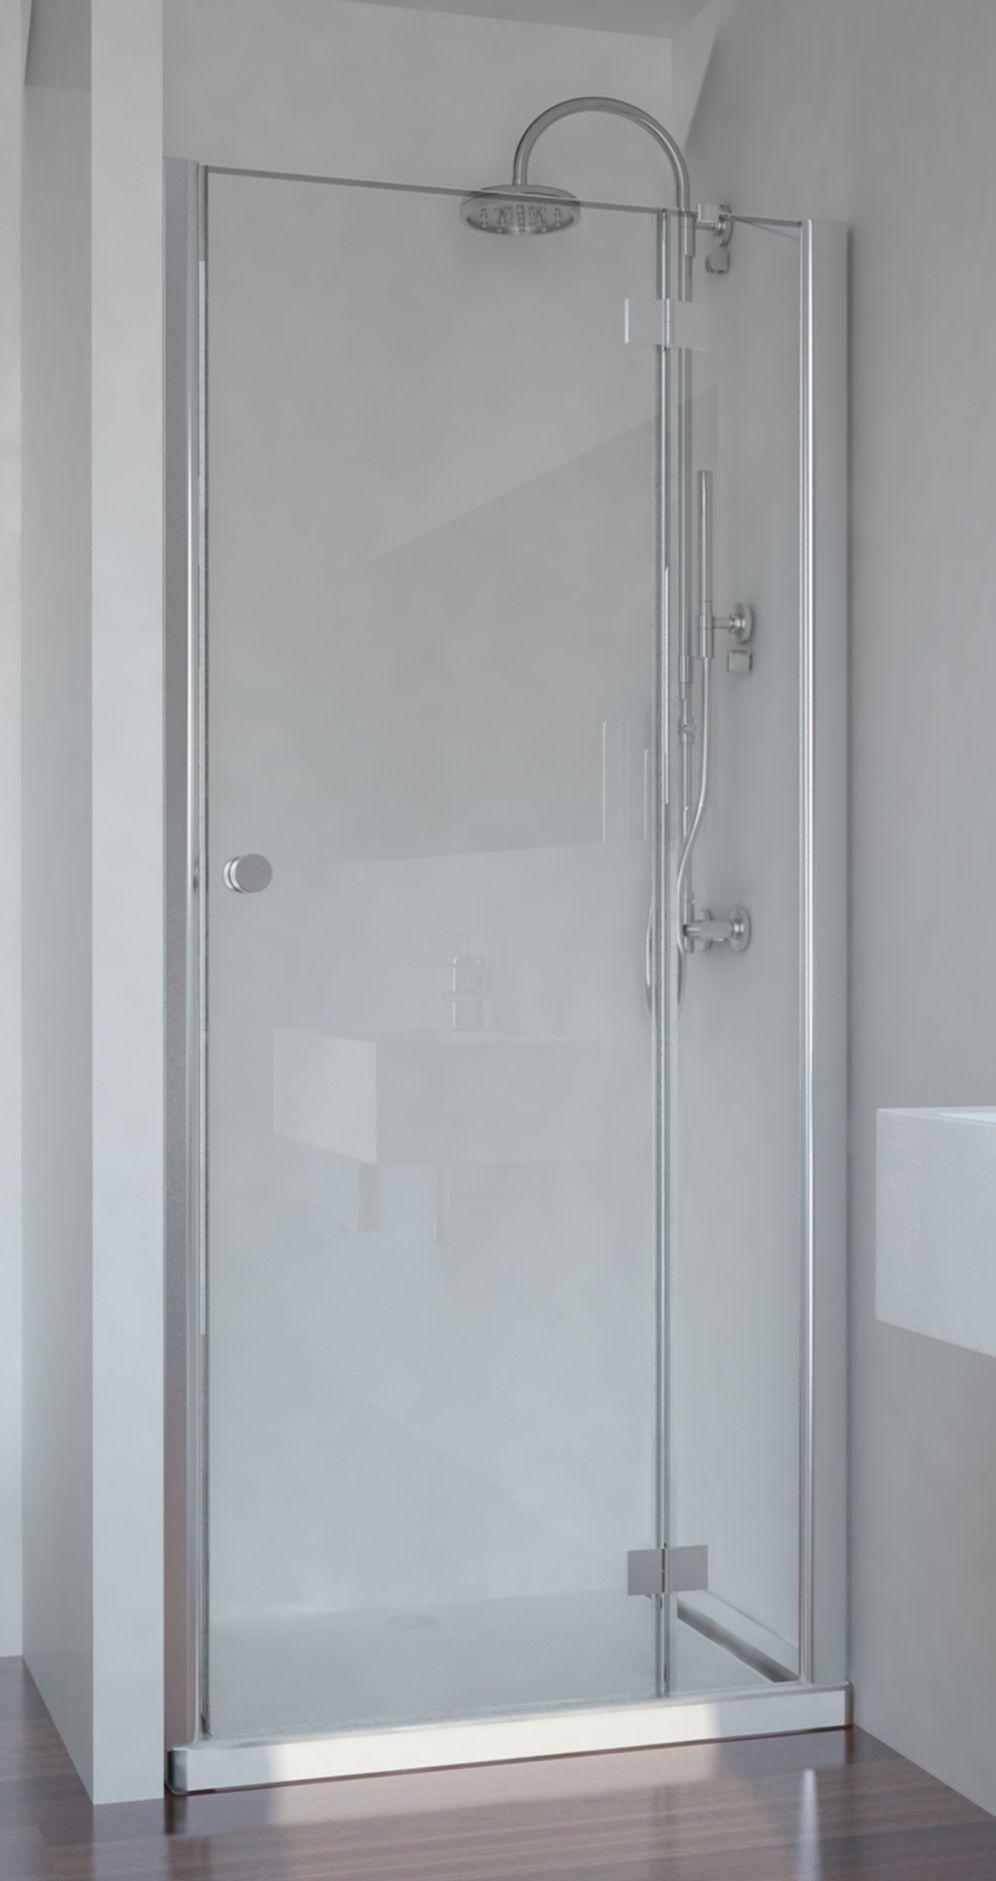 Badstuber Smart douchedeur 90x195cm rechts